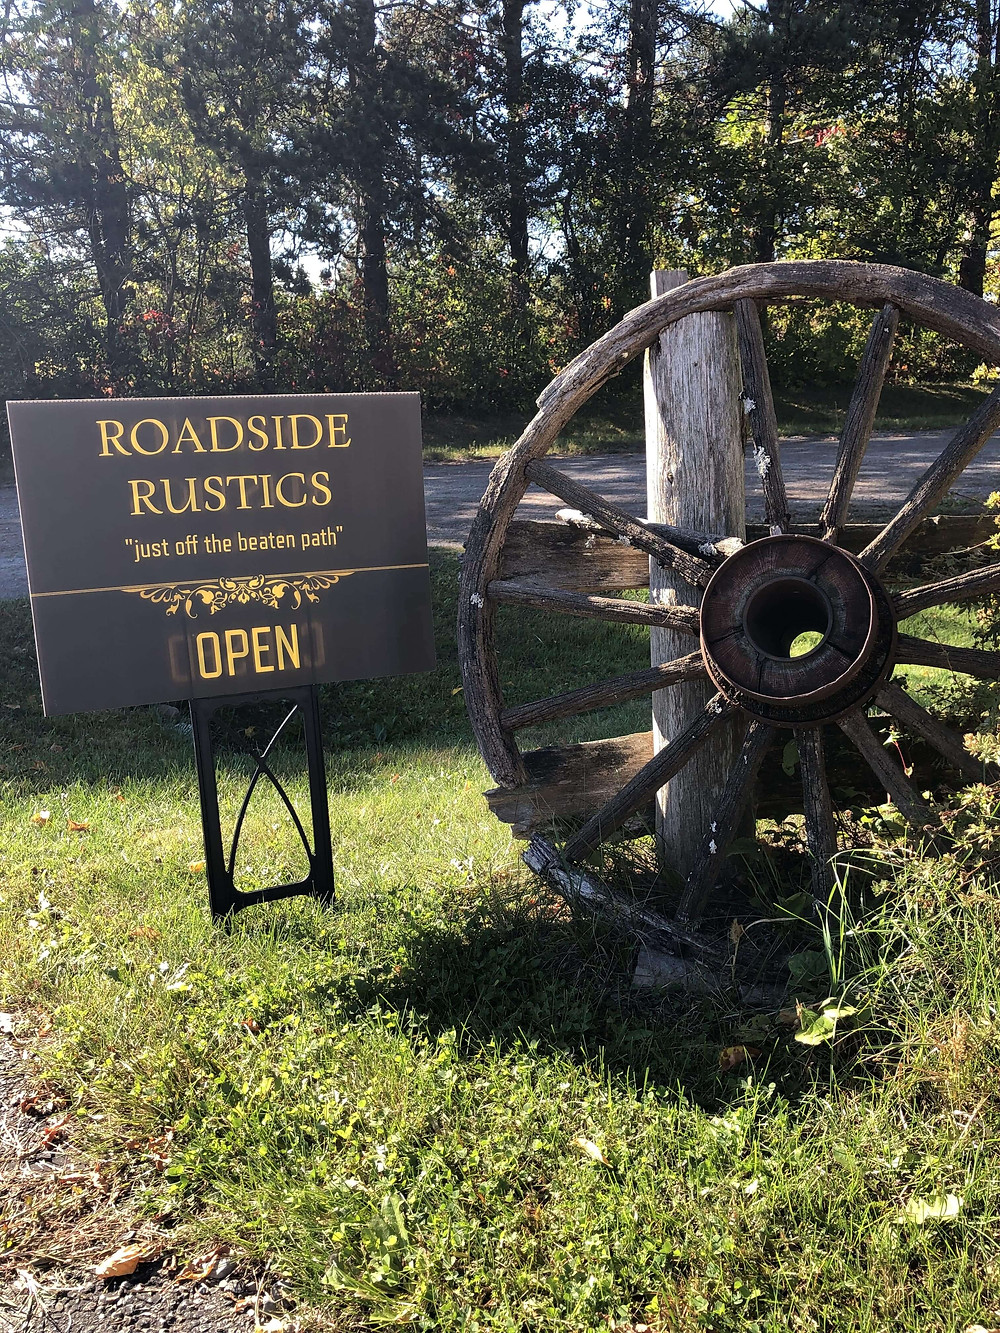 Roadside Rustics is open for business!